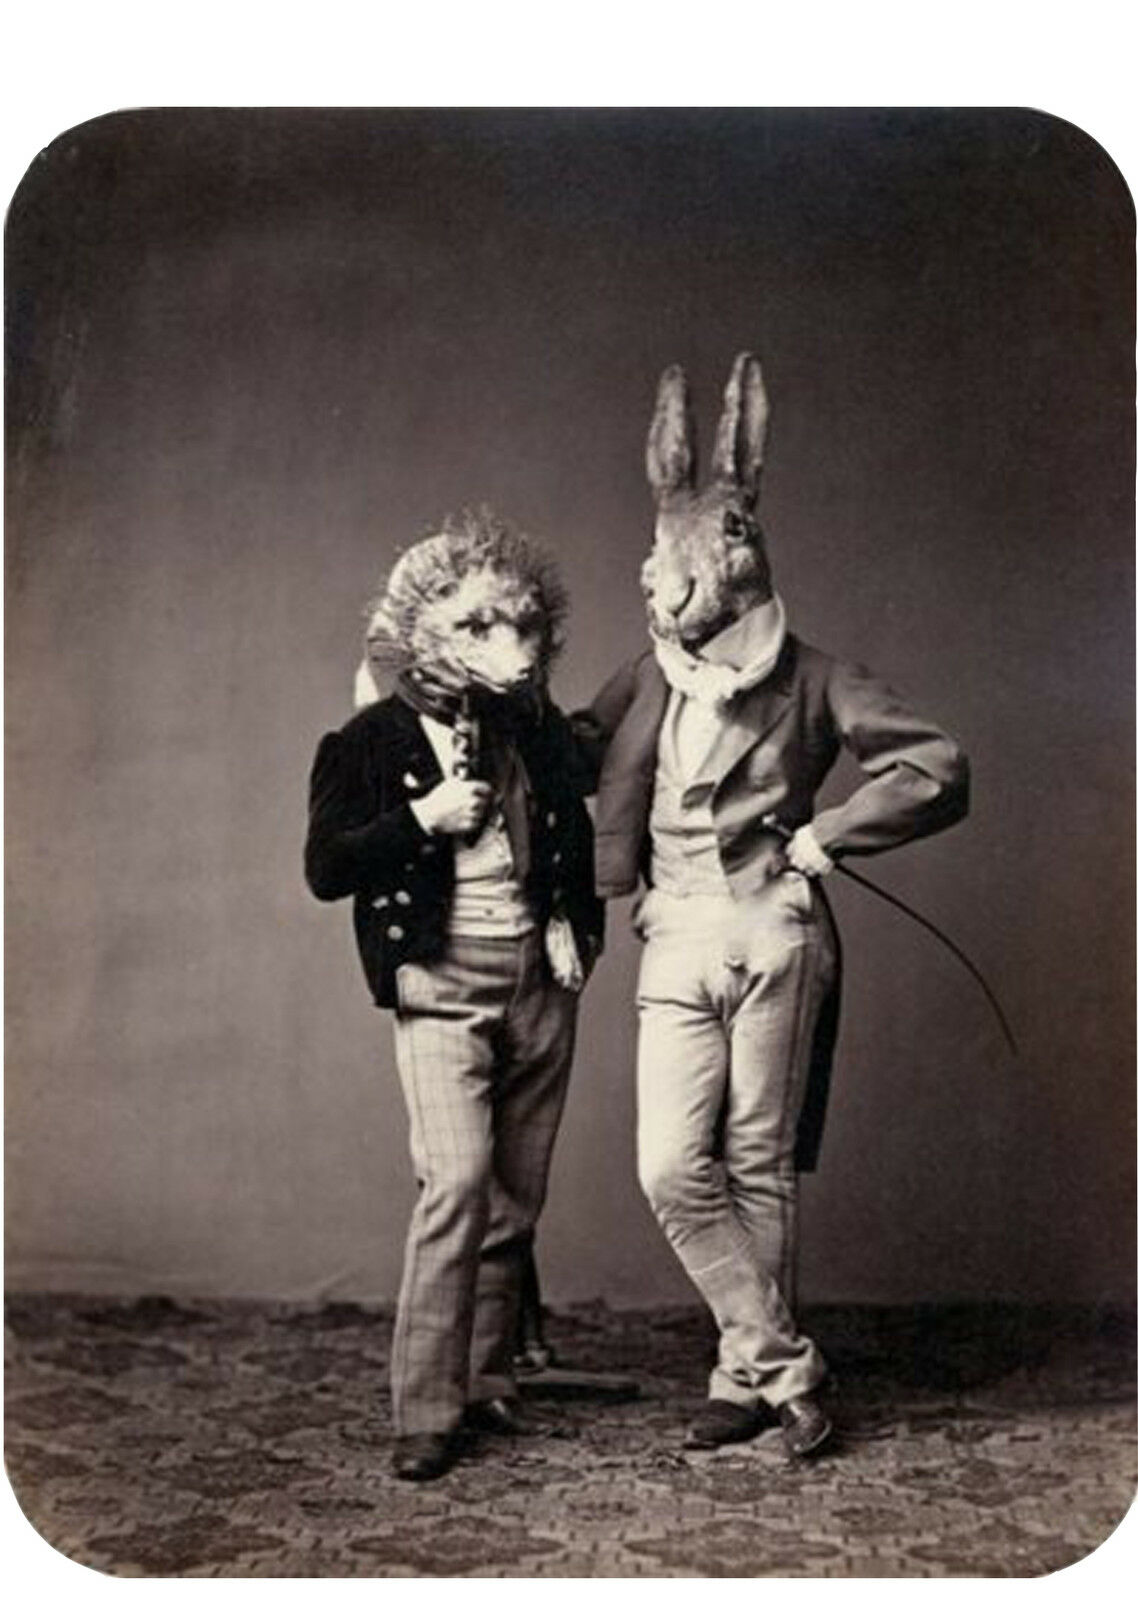 Funny Weird Odd Victorian Gentleman Wearing Animal Costumes T-shirt